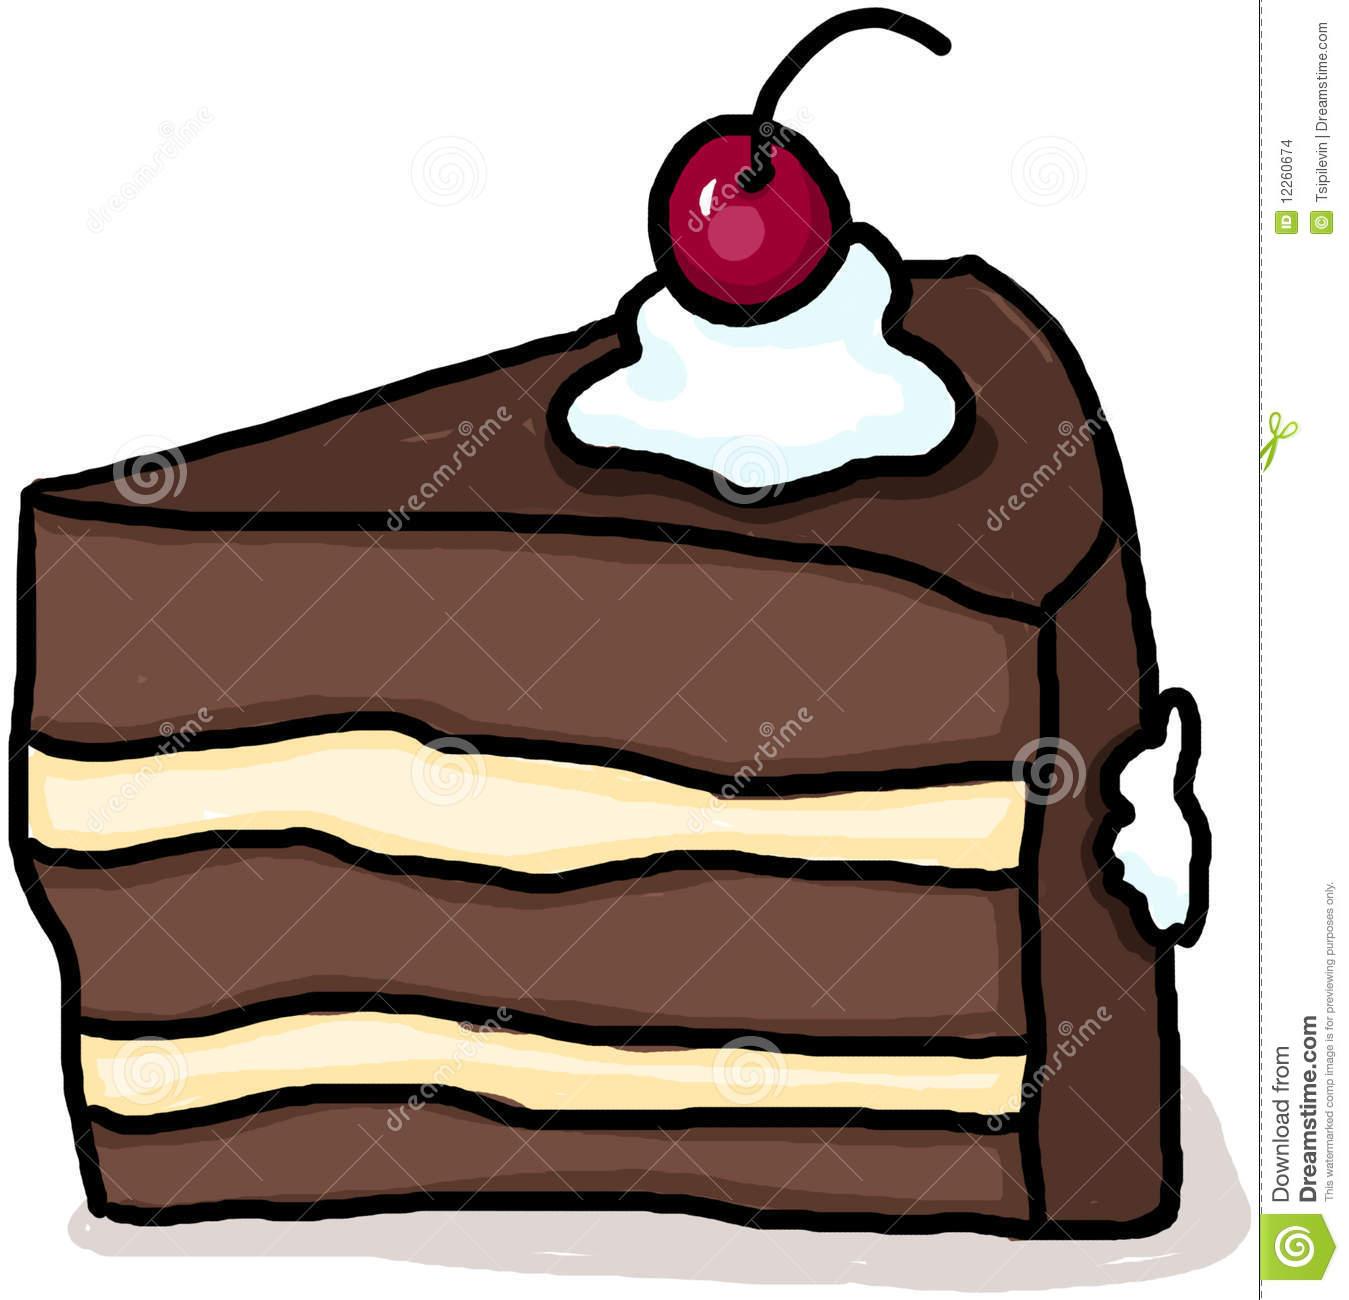 Drawn cake cherry Clipart Free Panda Clipart Chocolate